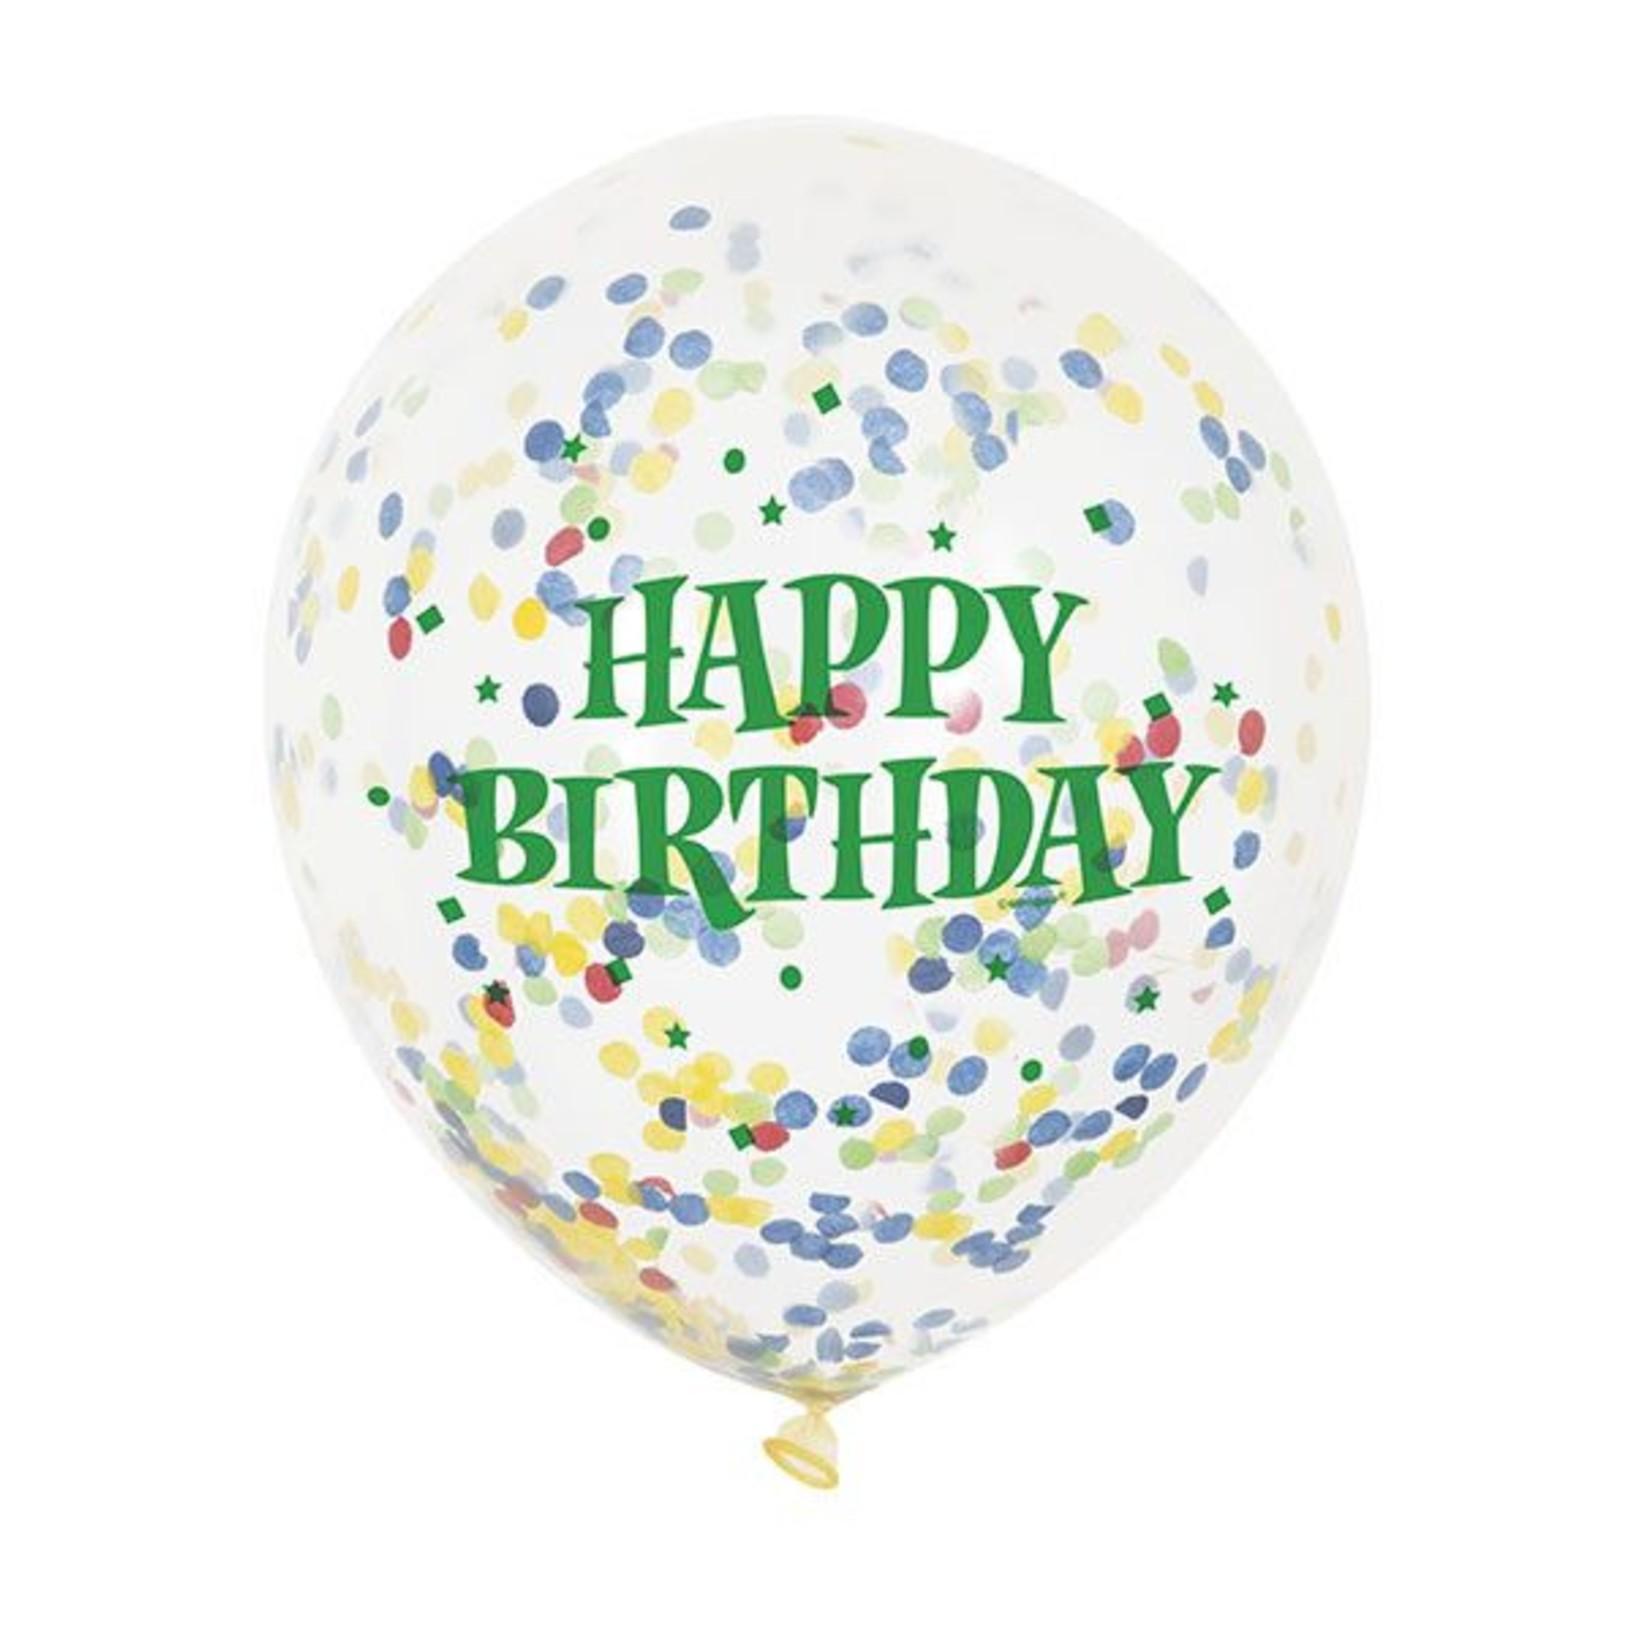 "Balloon - Latex - Happy Birthday  Confetti - 12"" (6PK)"